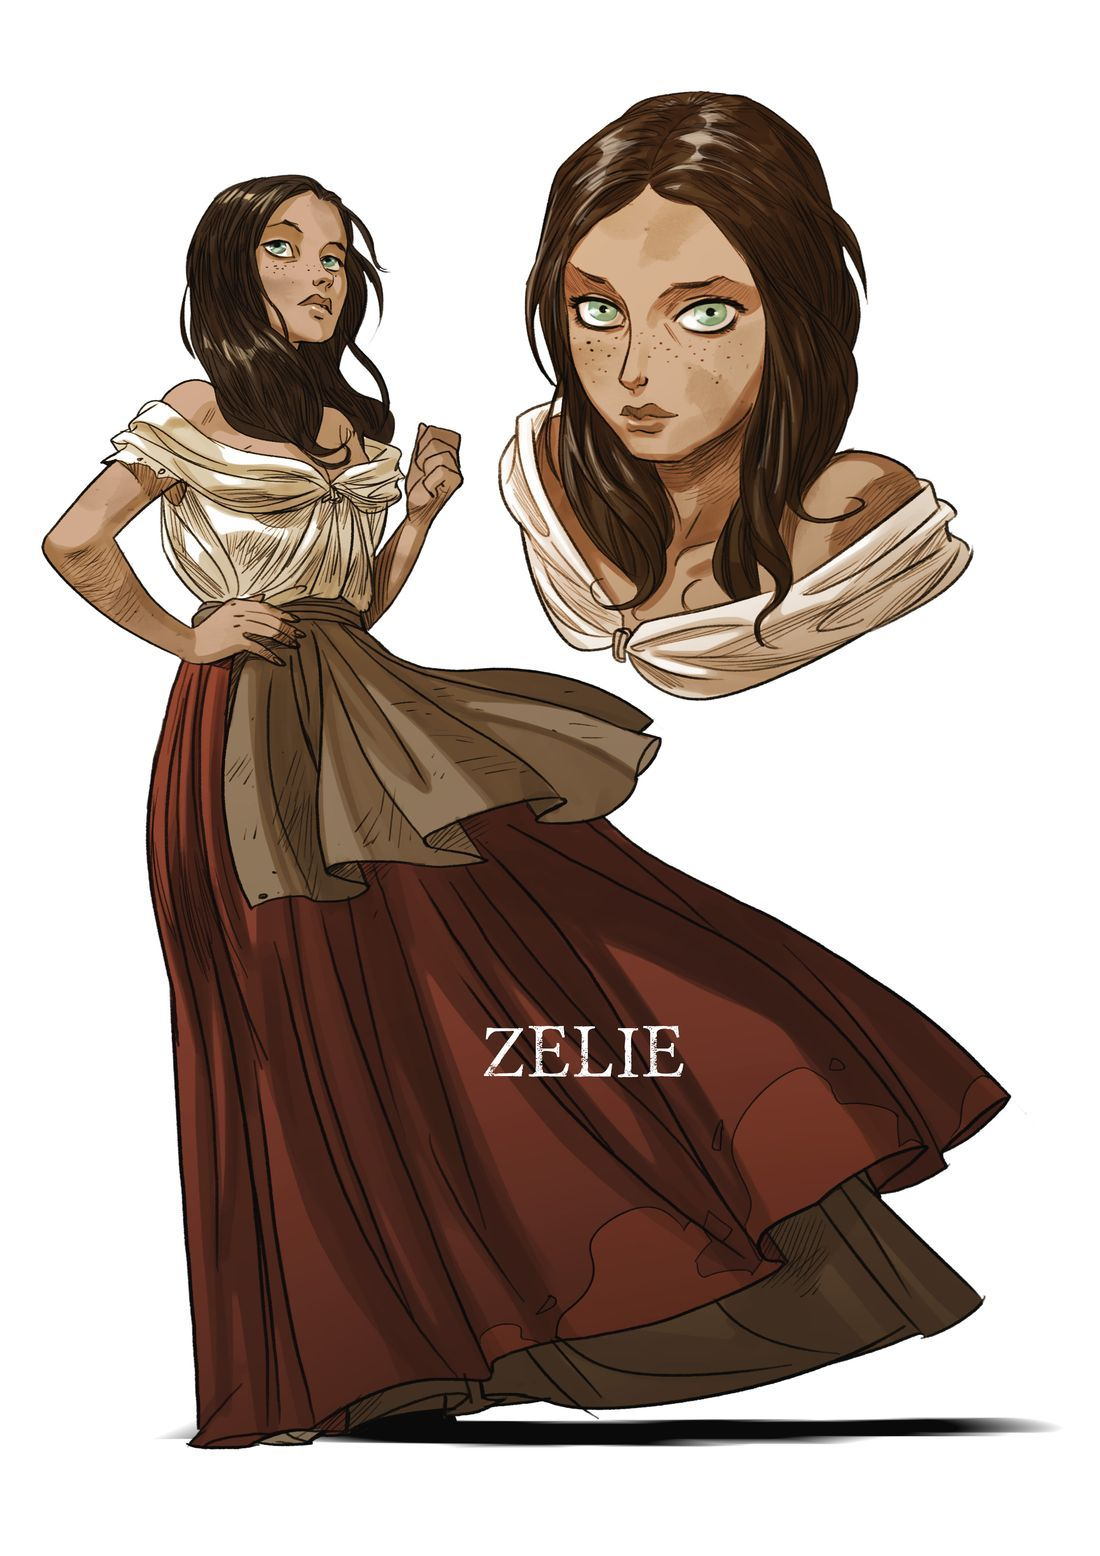 Legio Patria Nostra, recherche de personnage : Zélie © Boidin